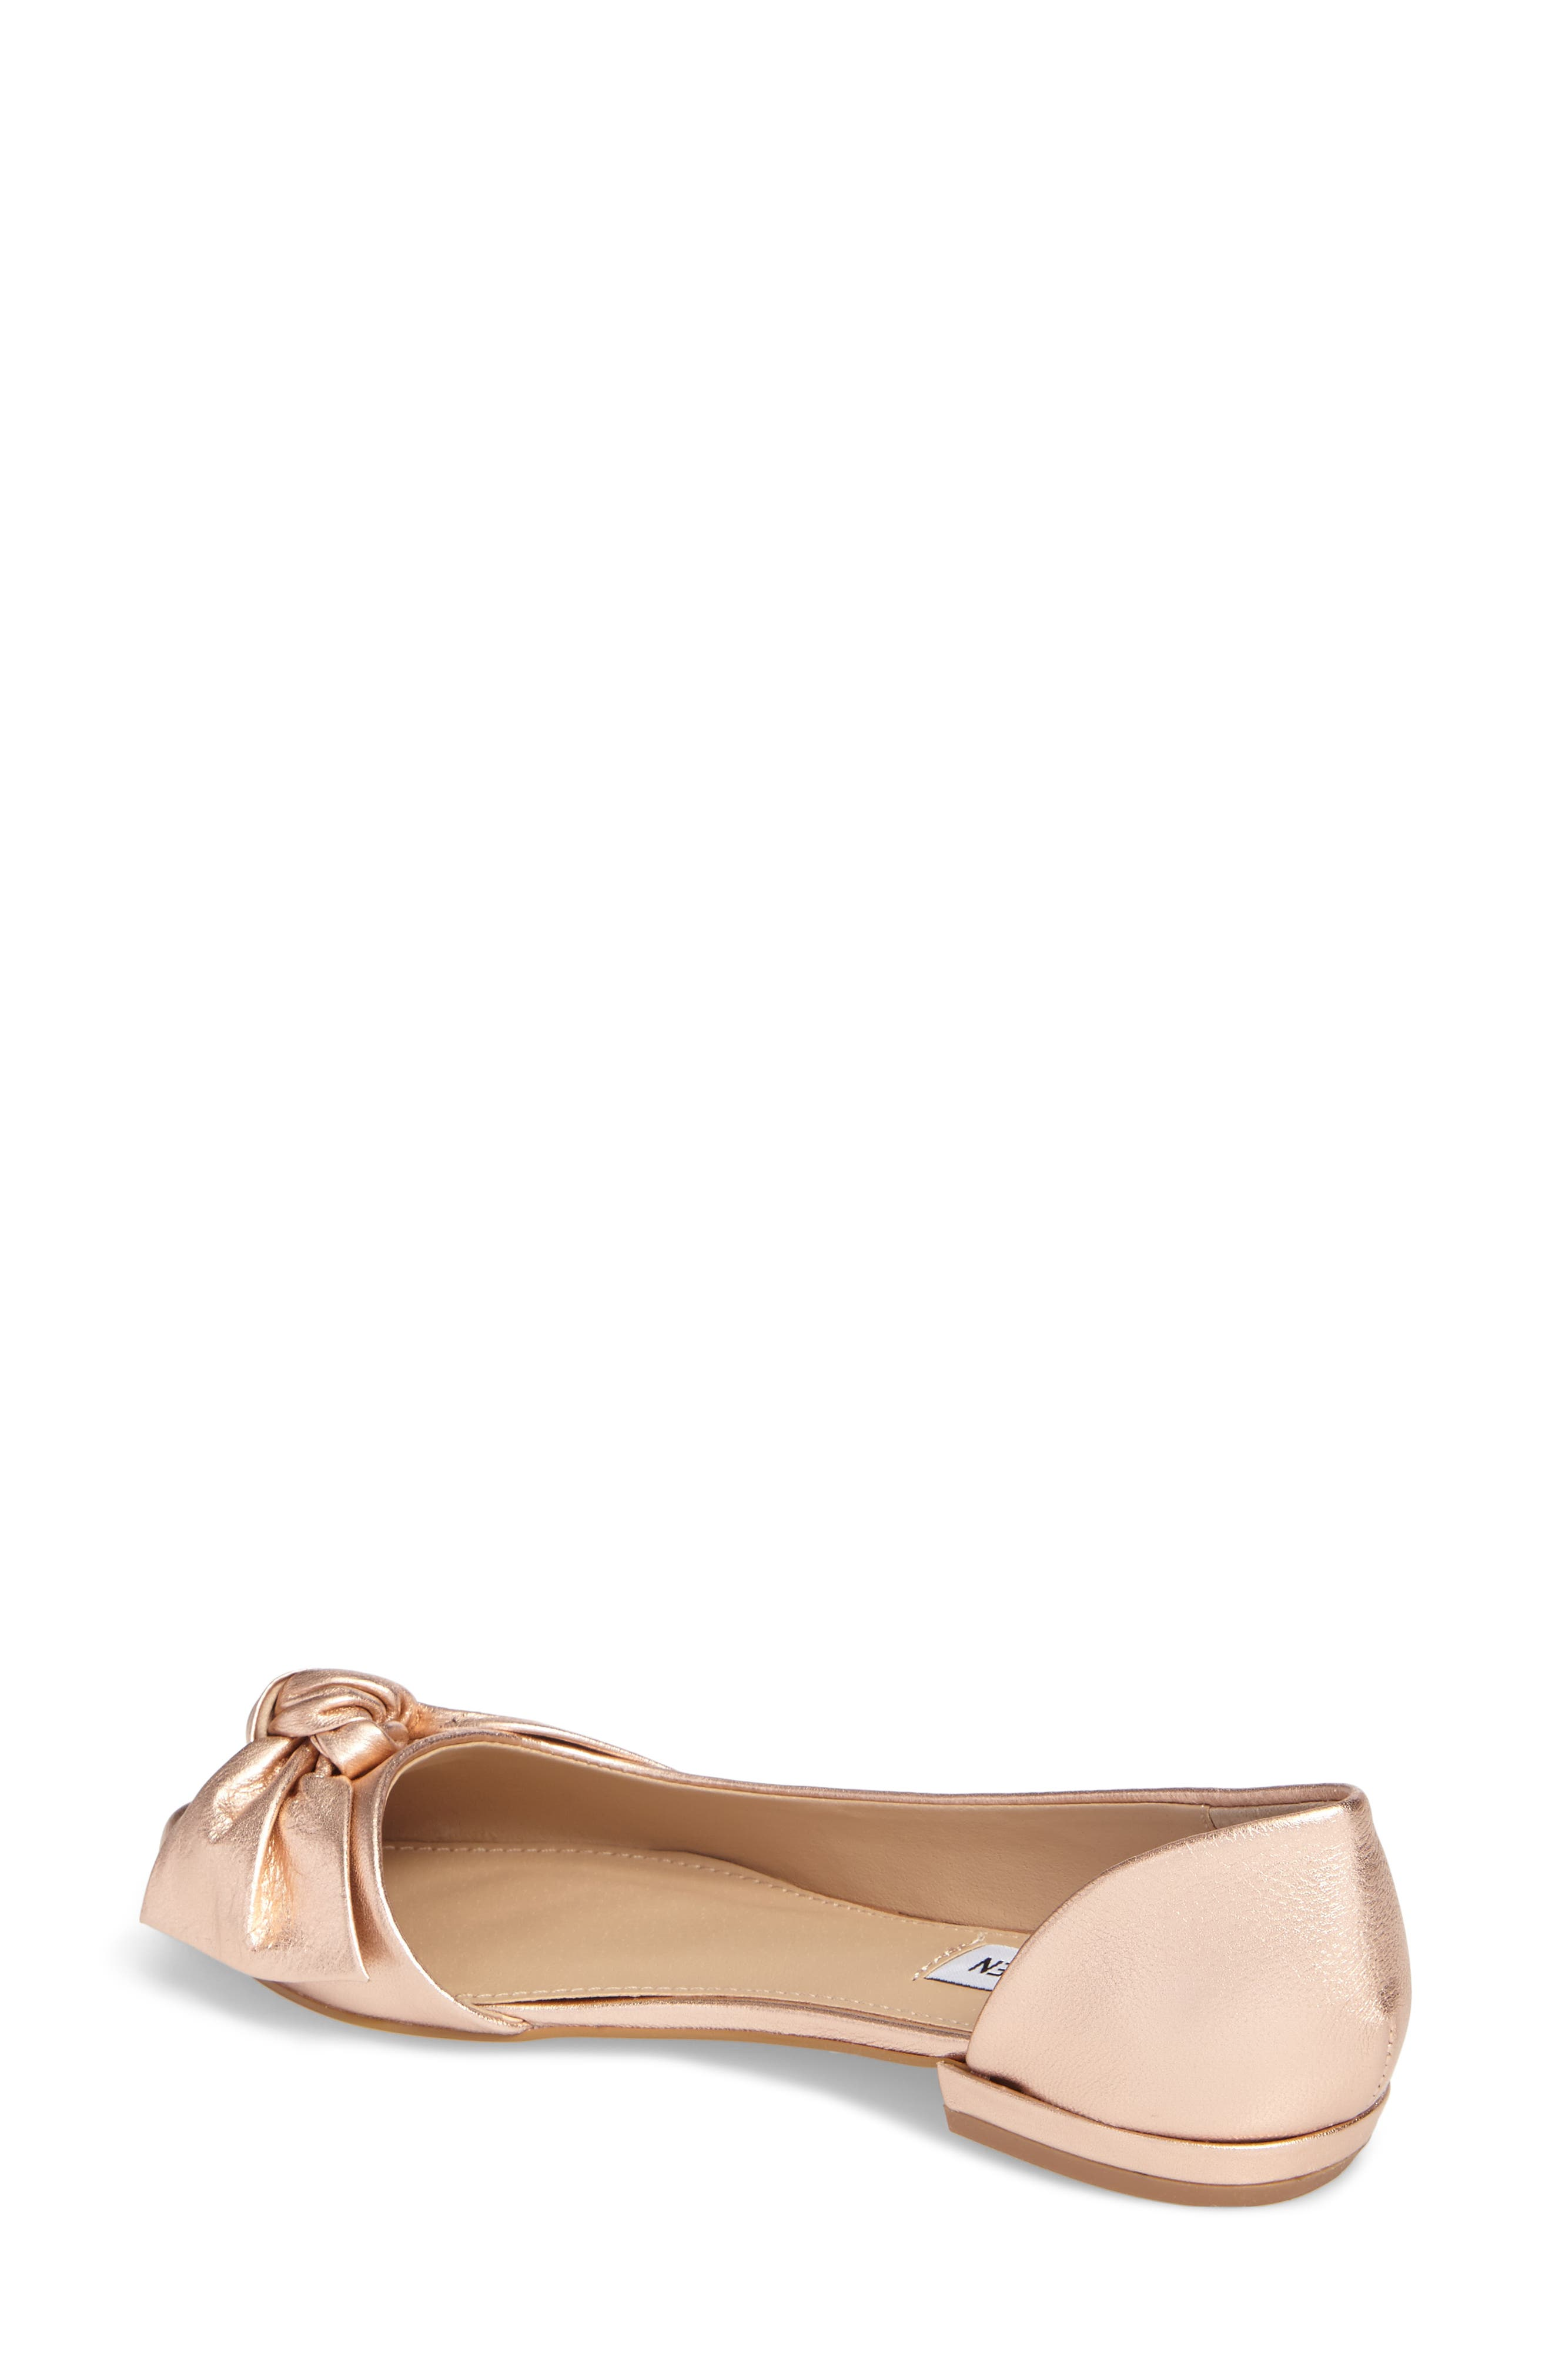 Edina d'Orsay Bow Flat,                             Alternate thumbnail 2, color,                             Rose Gold Leather